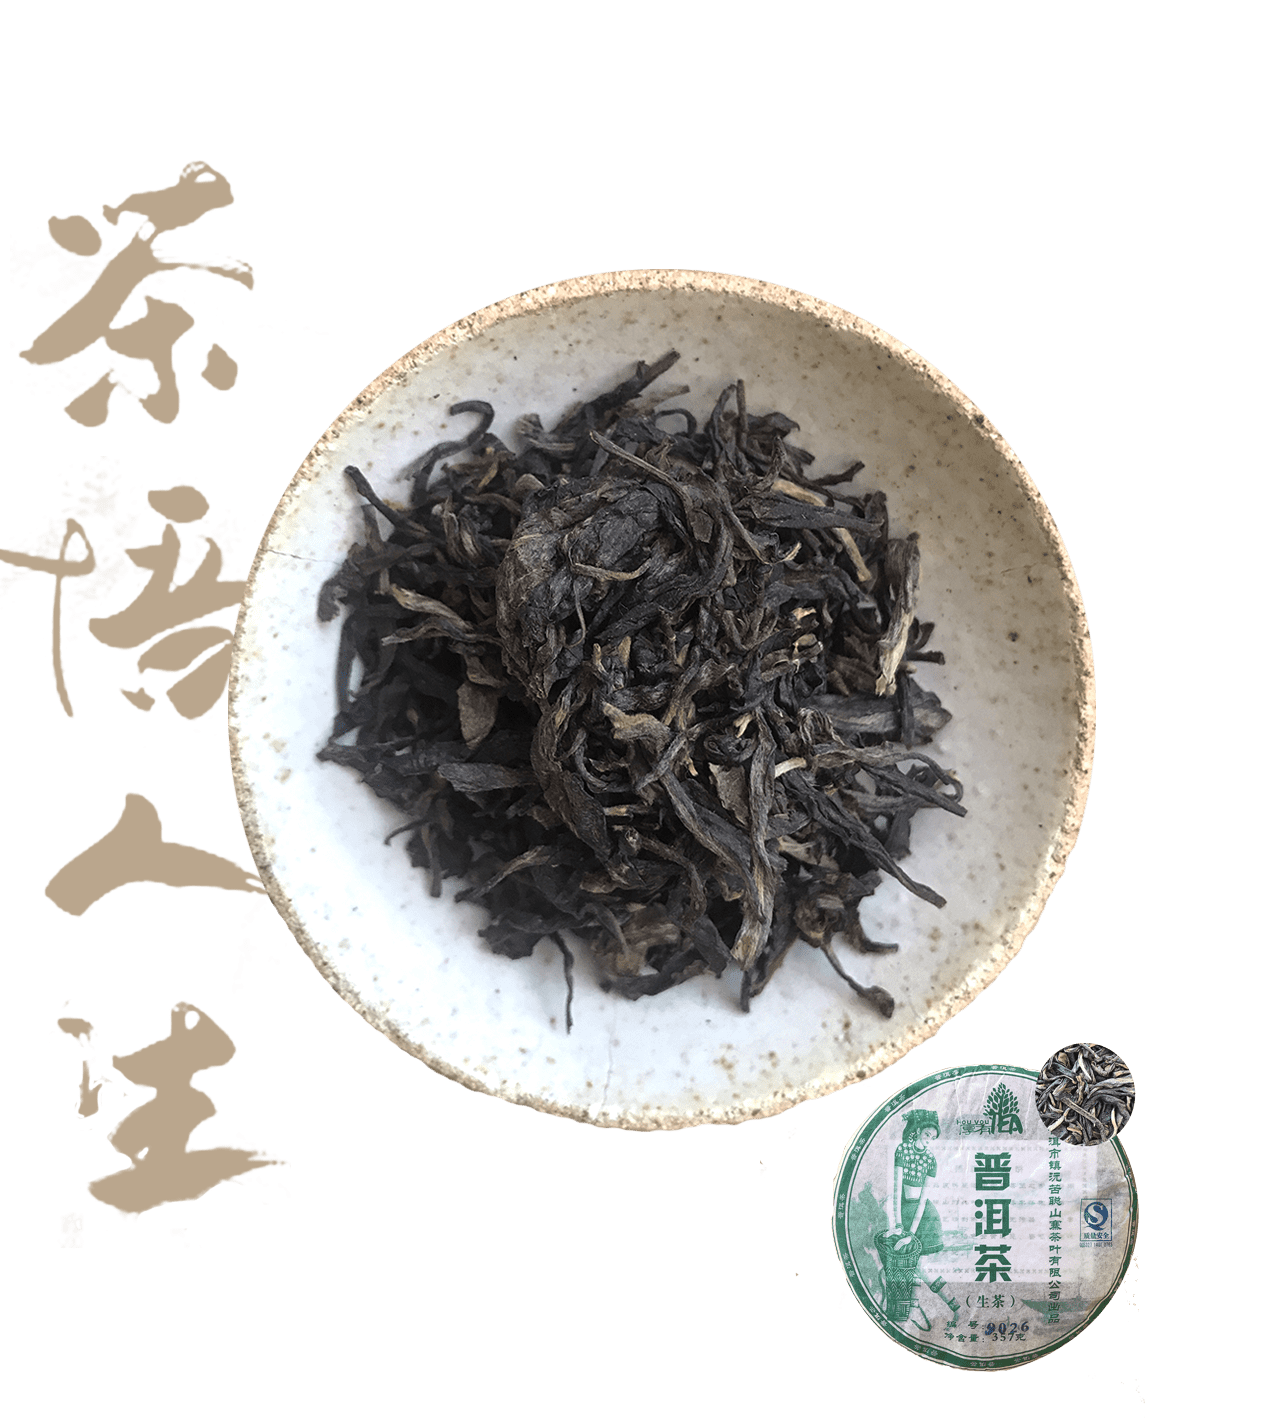 Hou you tea 9026 est un thé puerh cru sheng